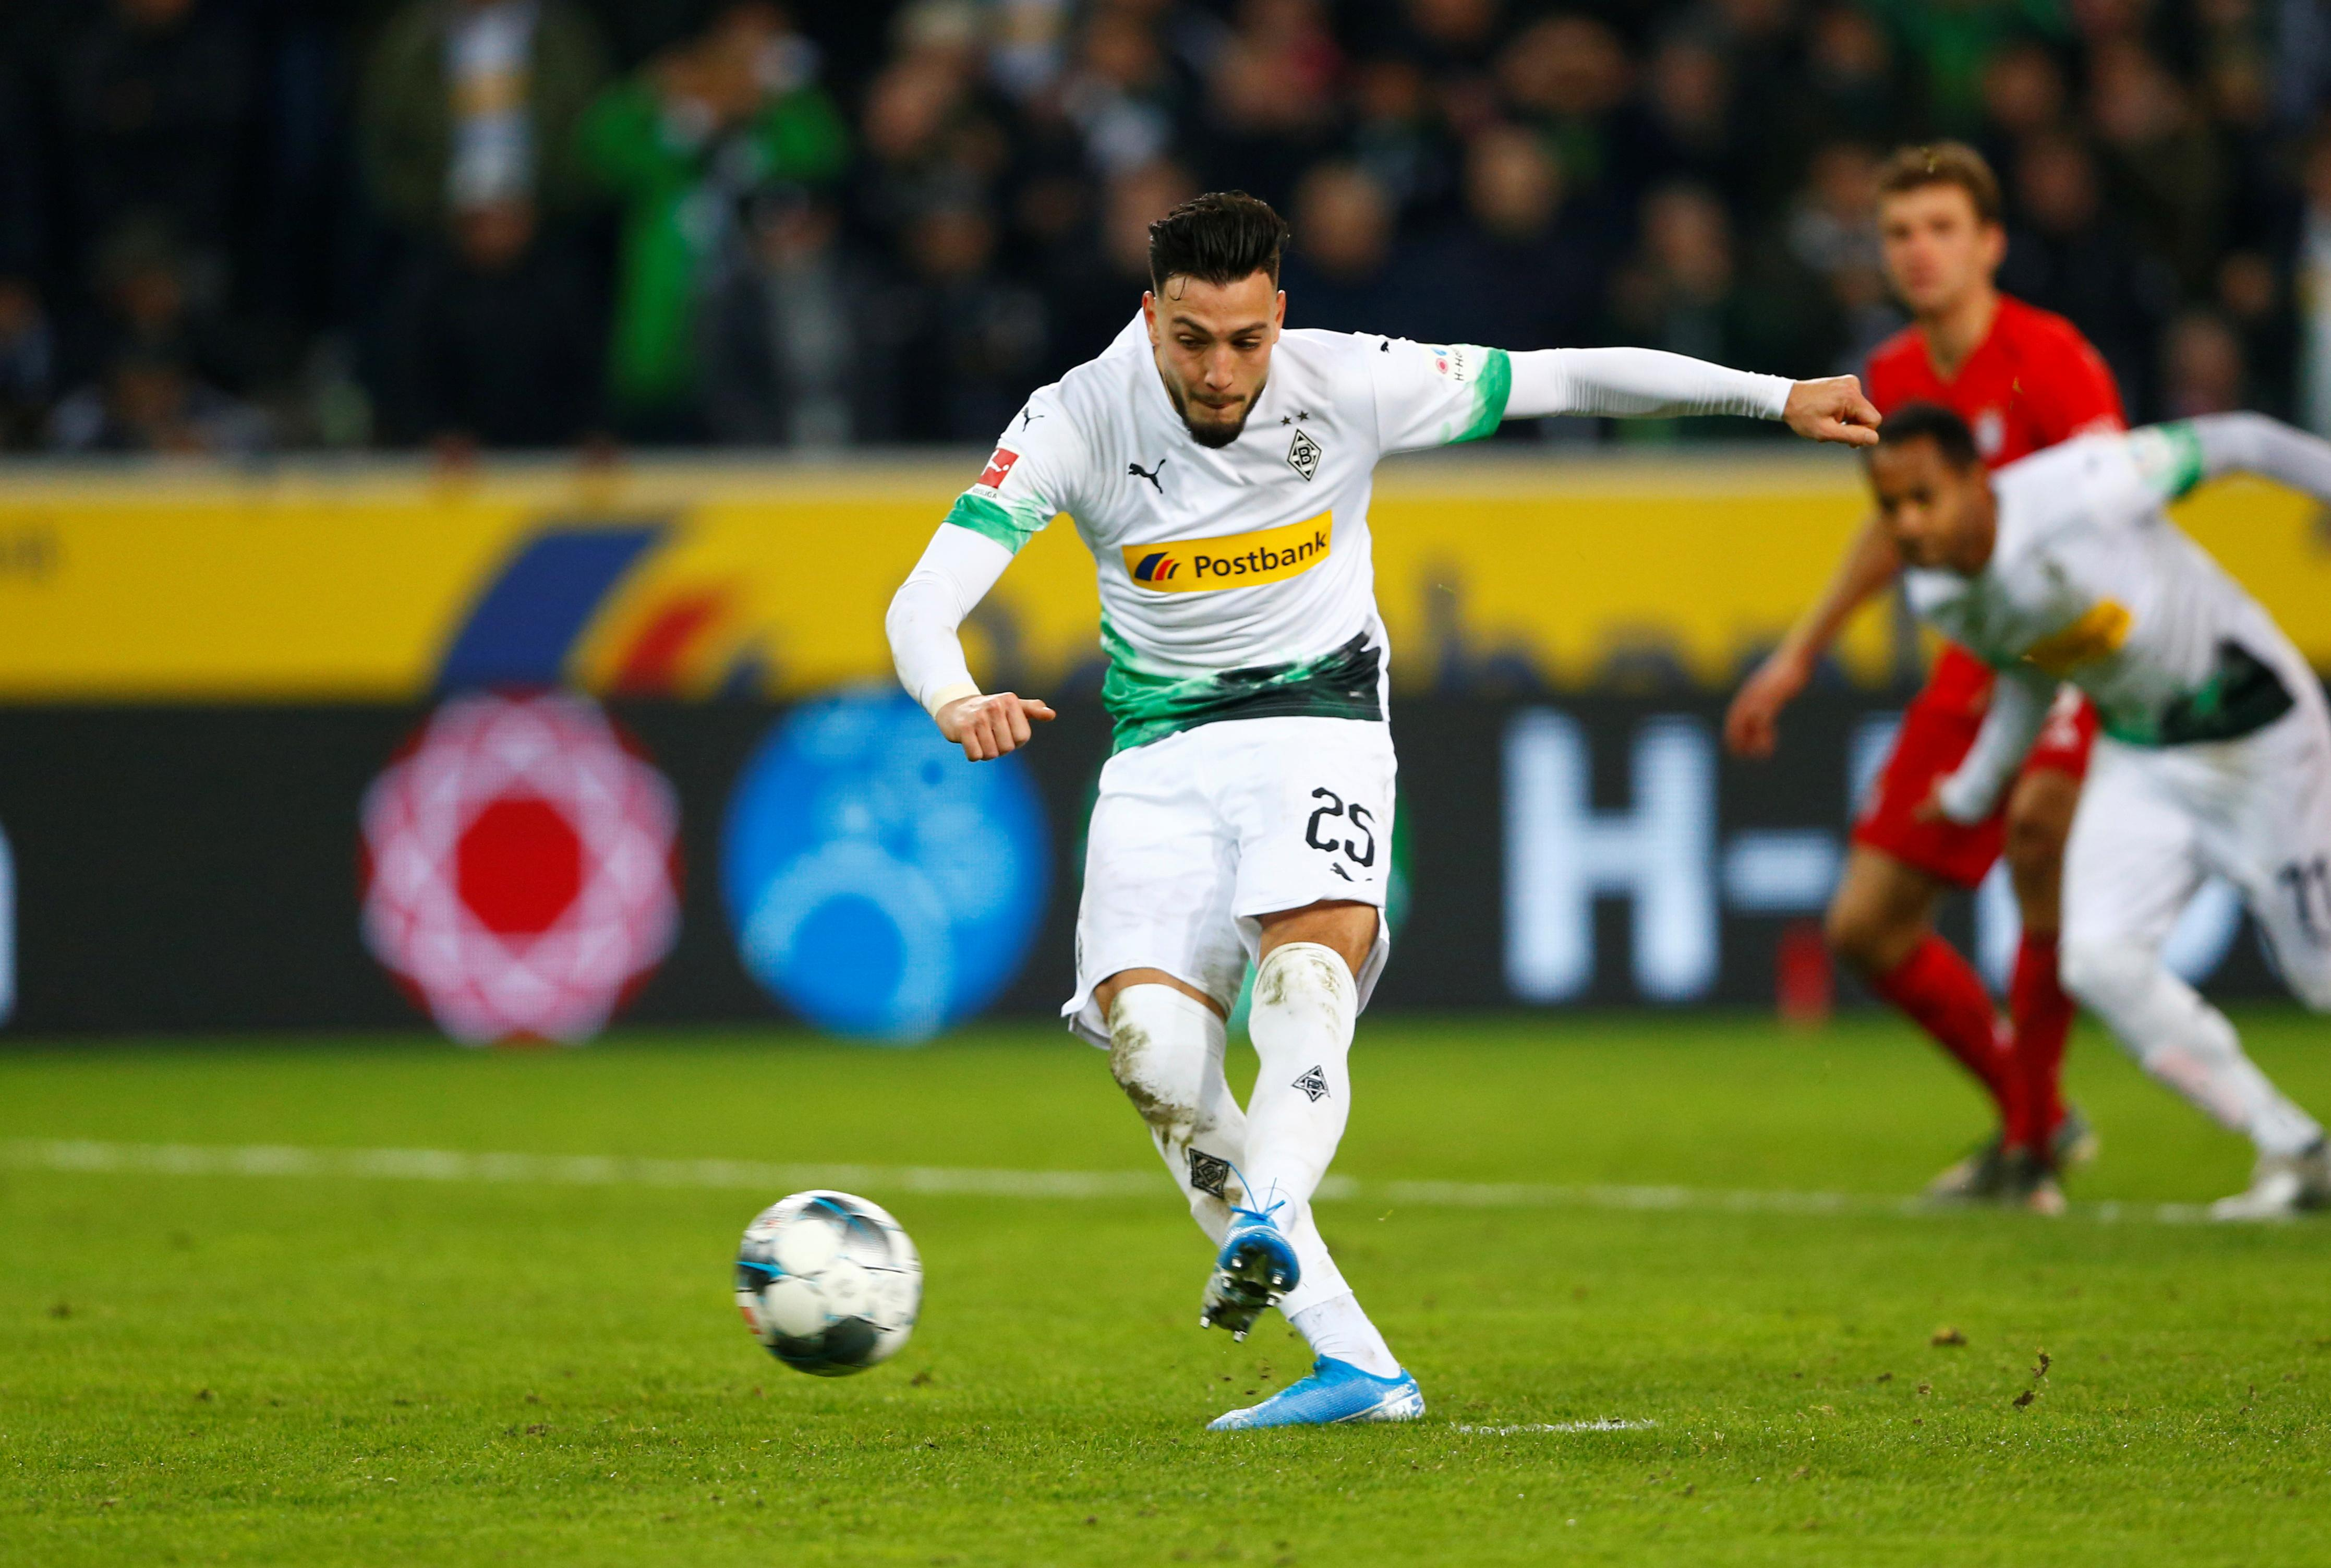 Gladbach stun Bayern 2-1 with last-gasp penalty